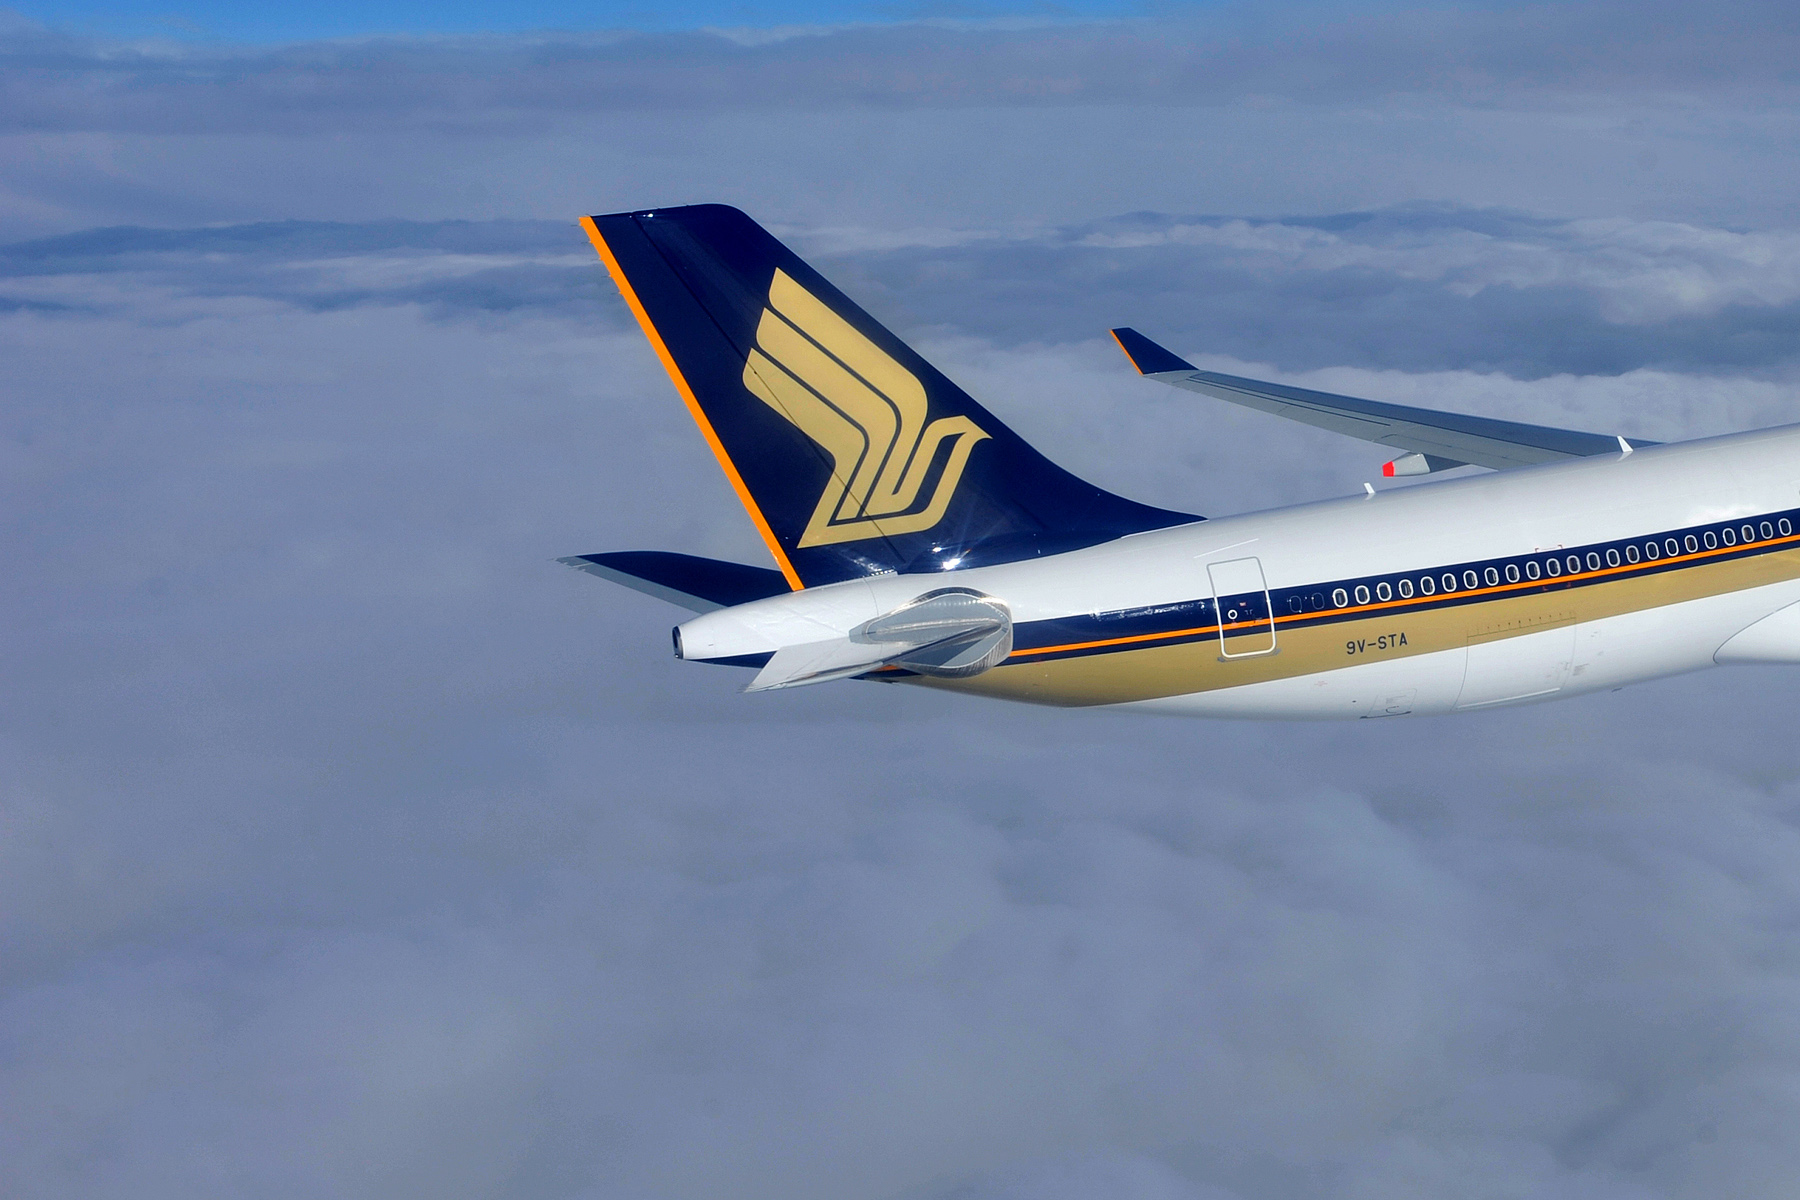 Singapore Airlines Fleet: August 2019